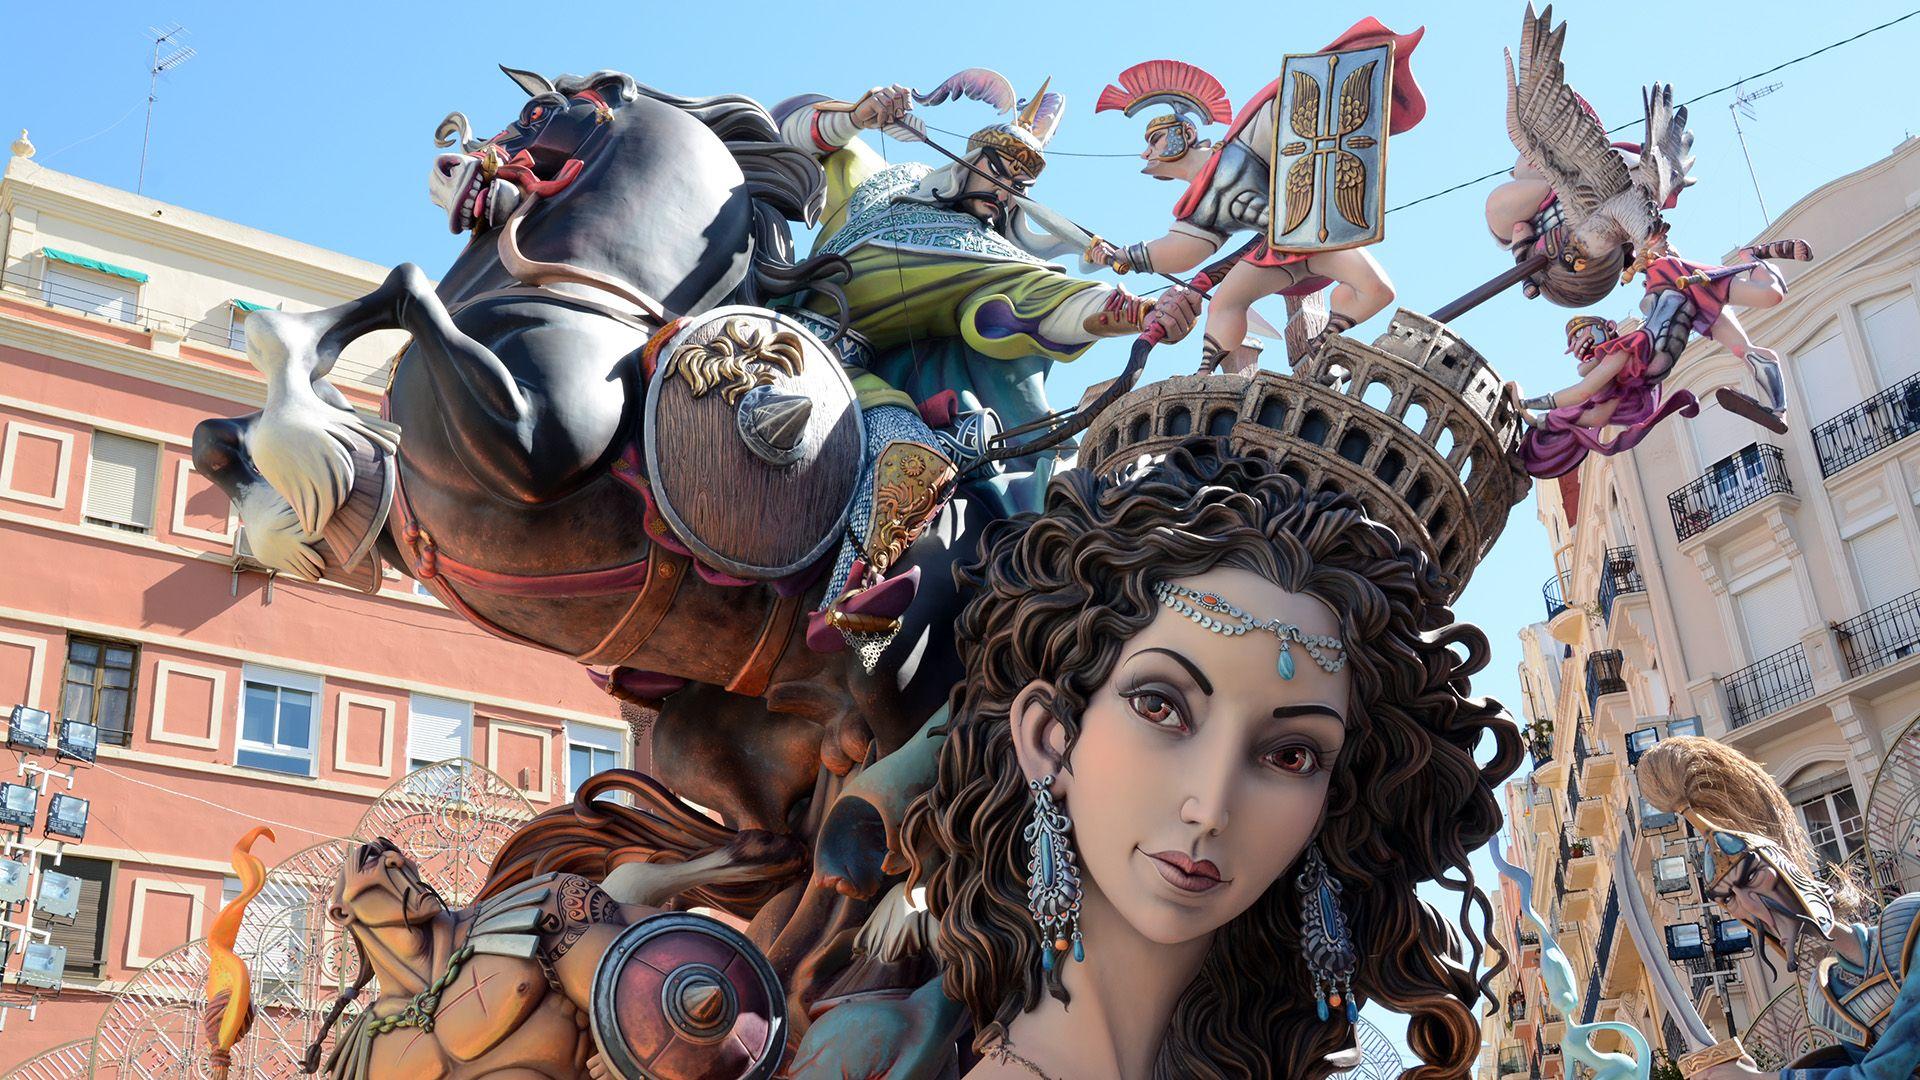 Valencia festivals, fairs and carnivals